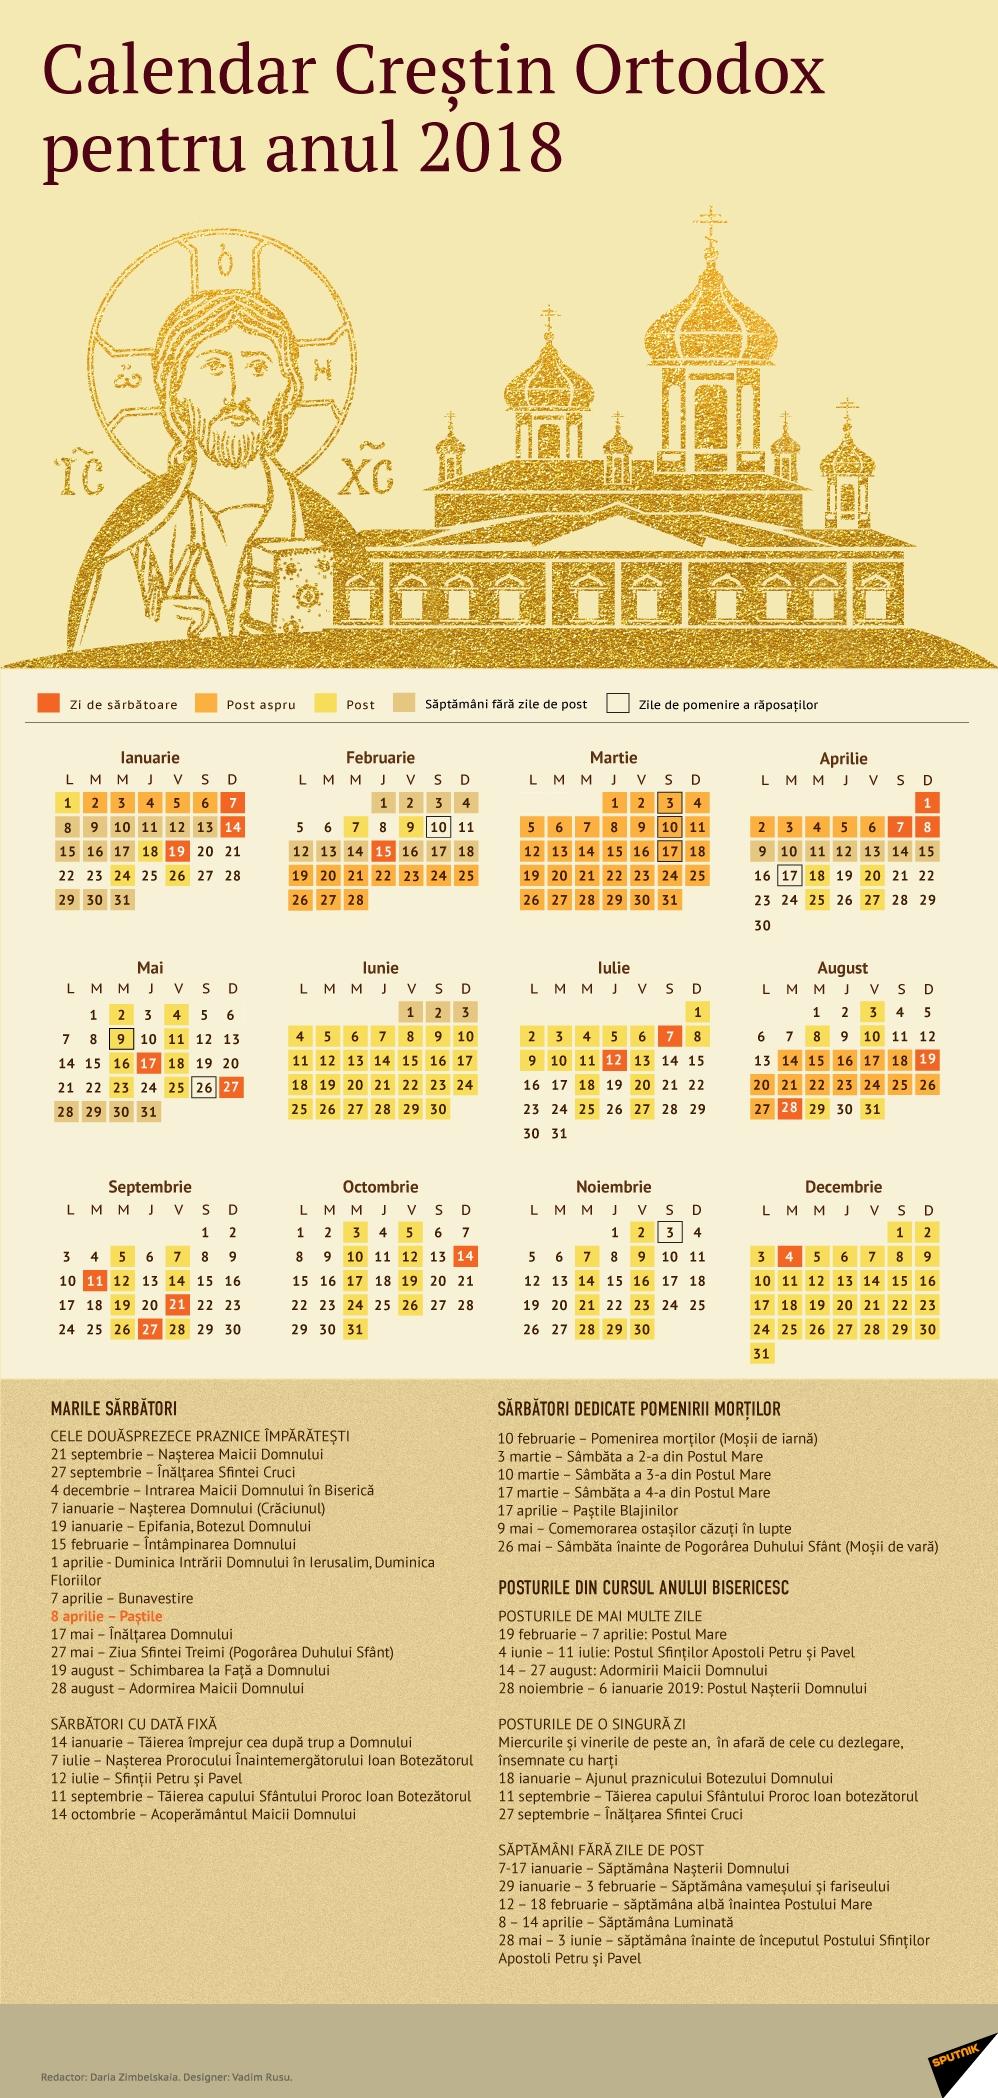 Calendar Creștin Ortodox 2018 8 Iunie 2019 Calendar Ortodox